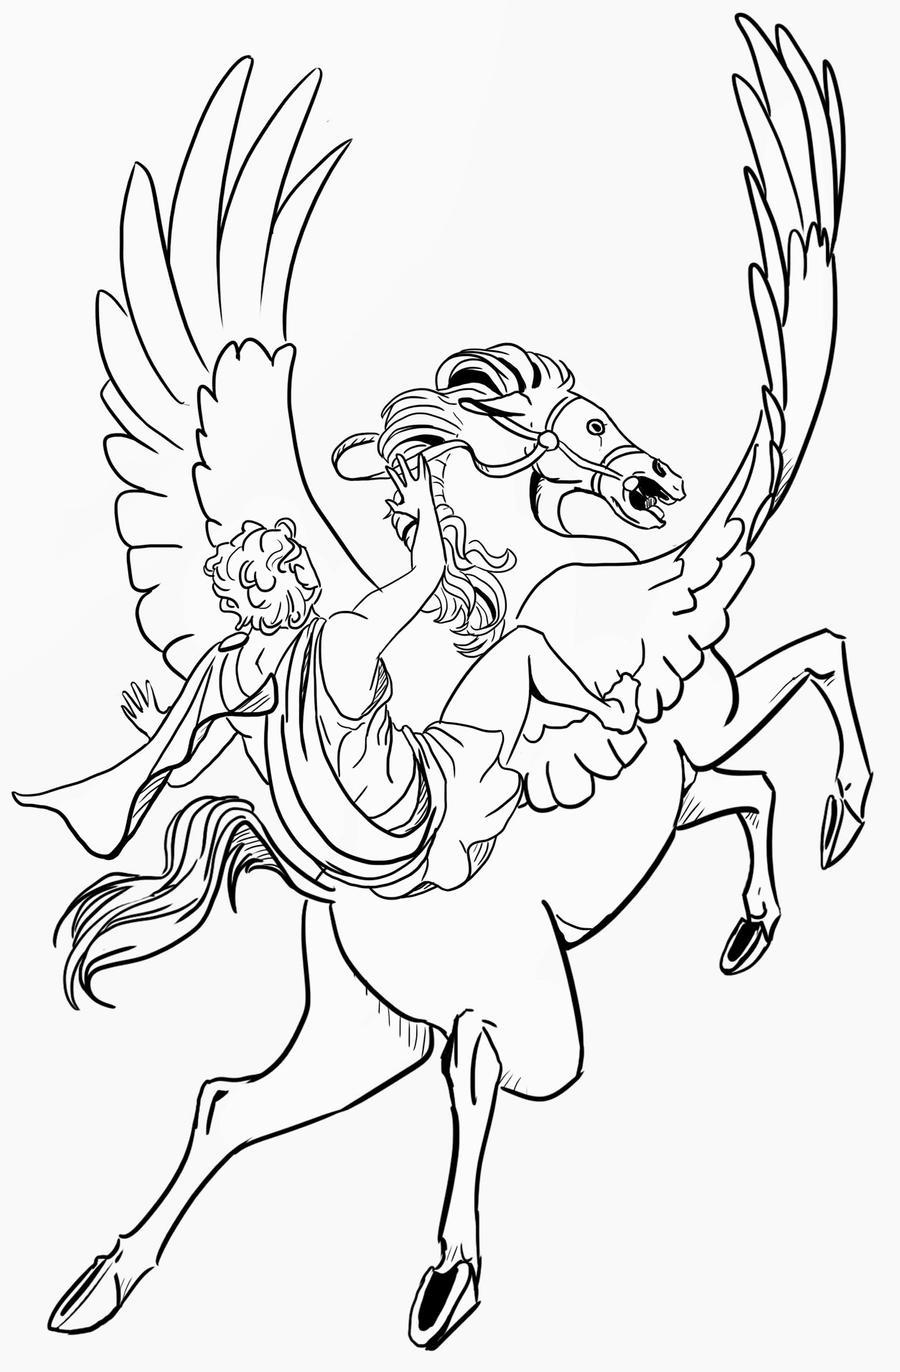 Bellerophon pegasus lineart by siaorie on DeviantArt